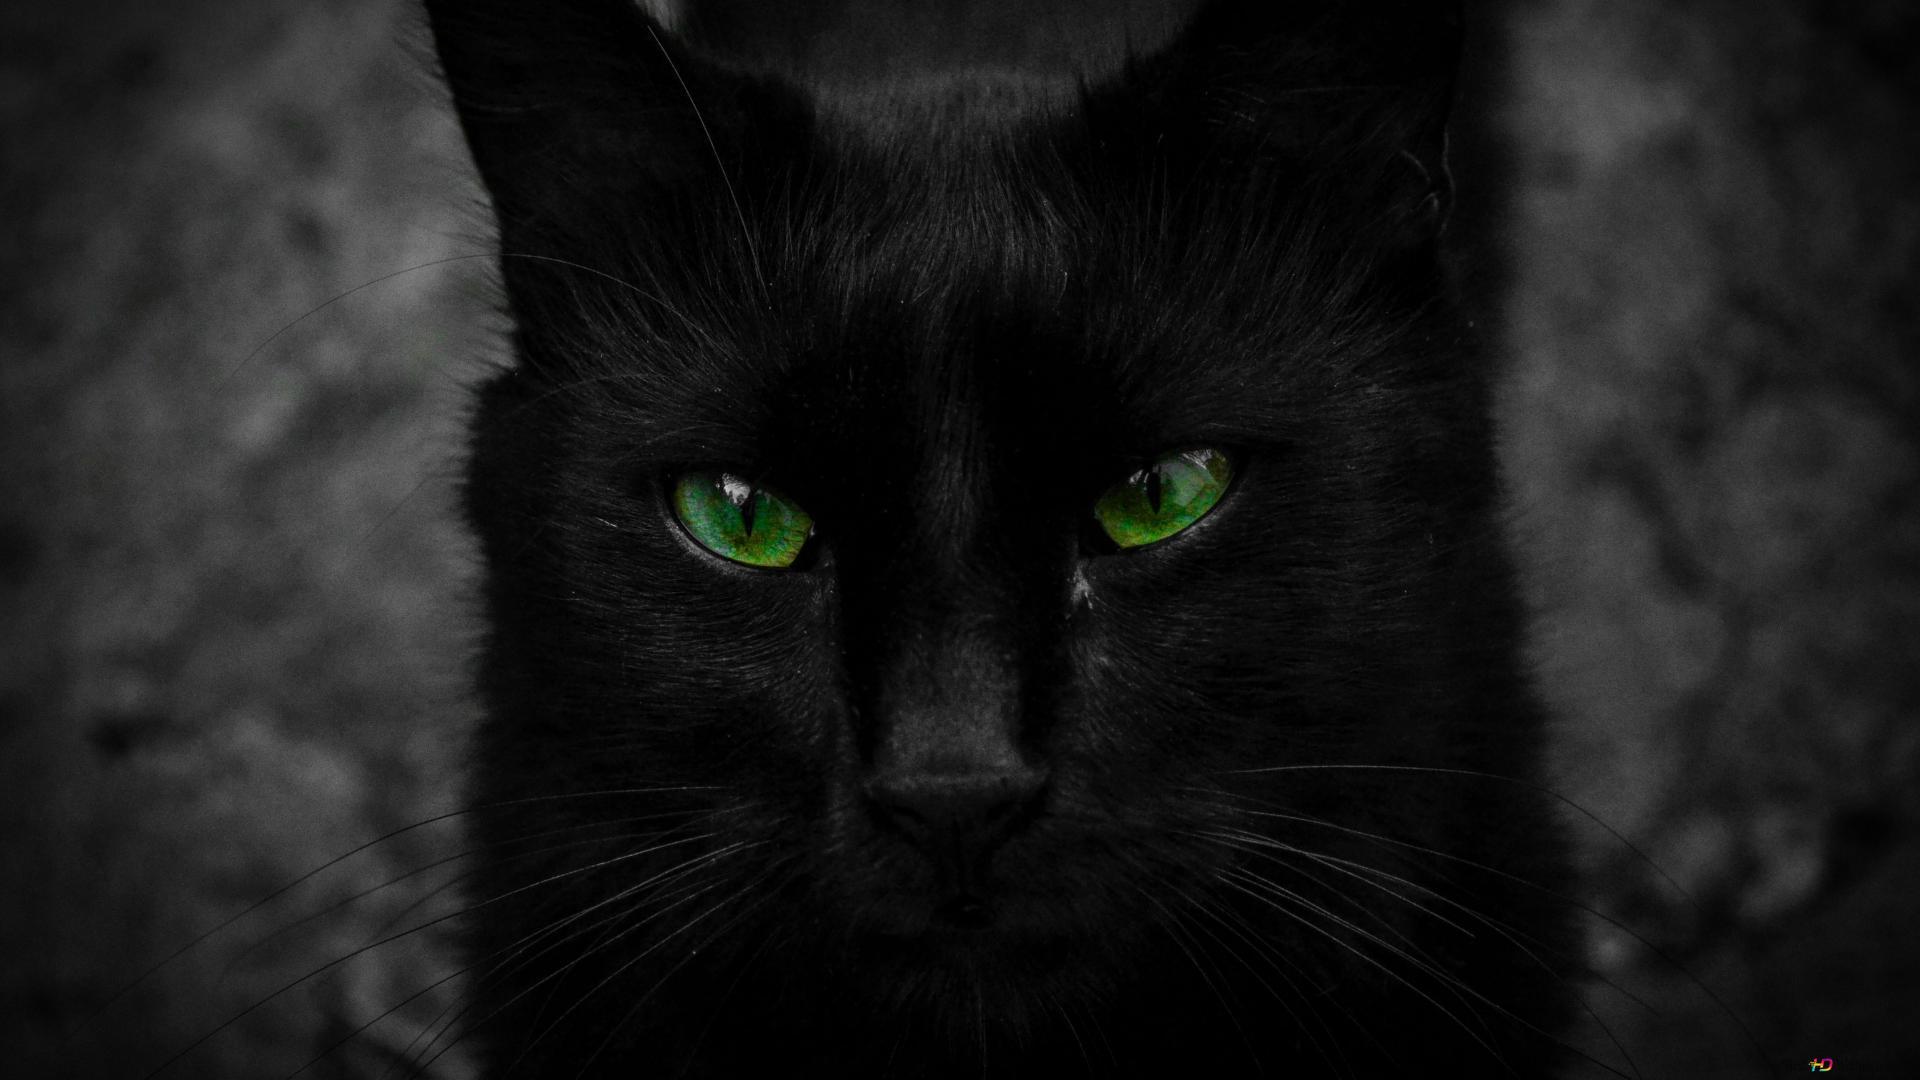 Green Eyed Black Cat Hd Wallpaper Download